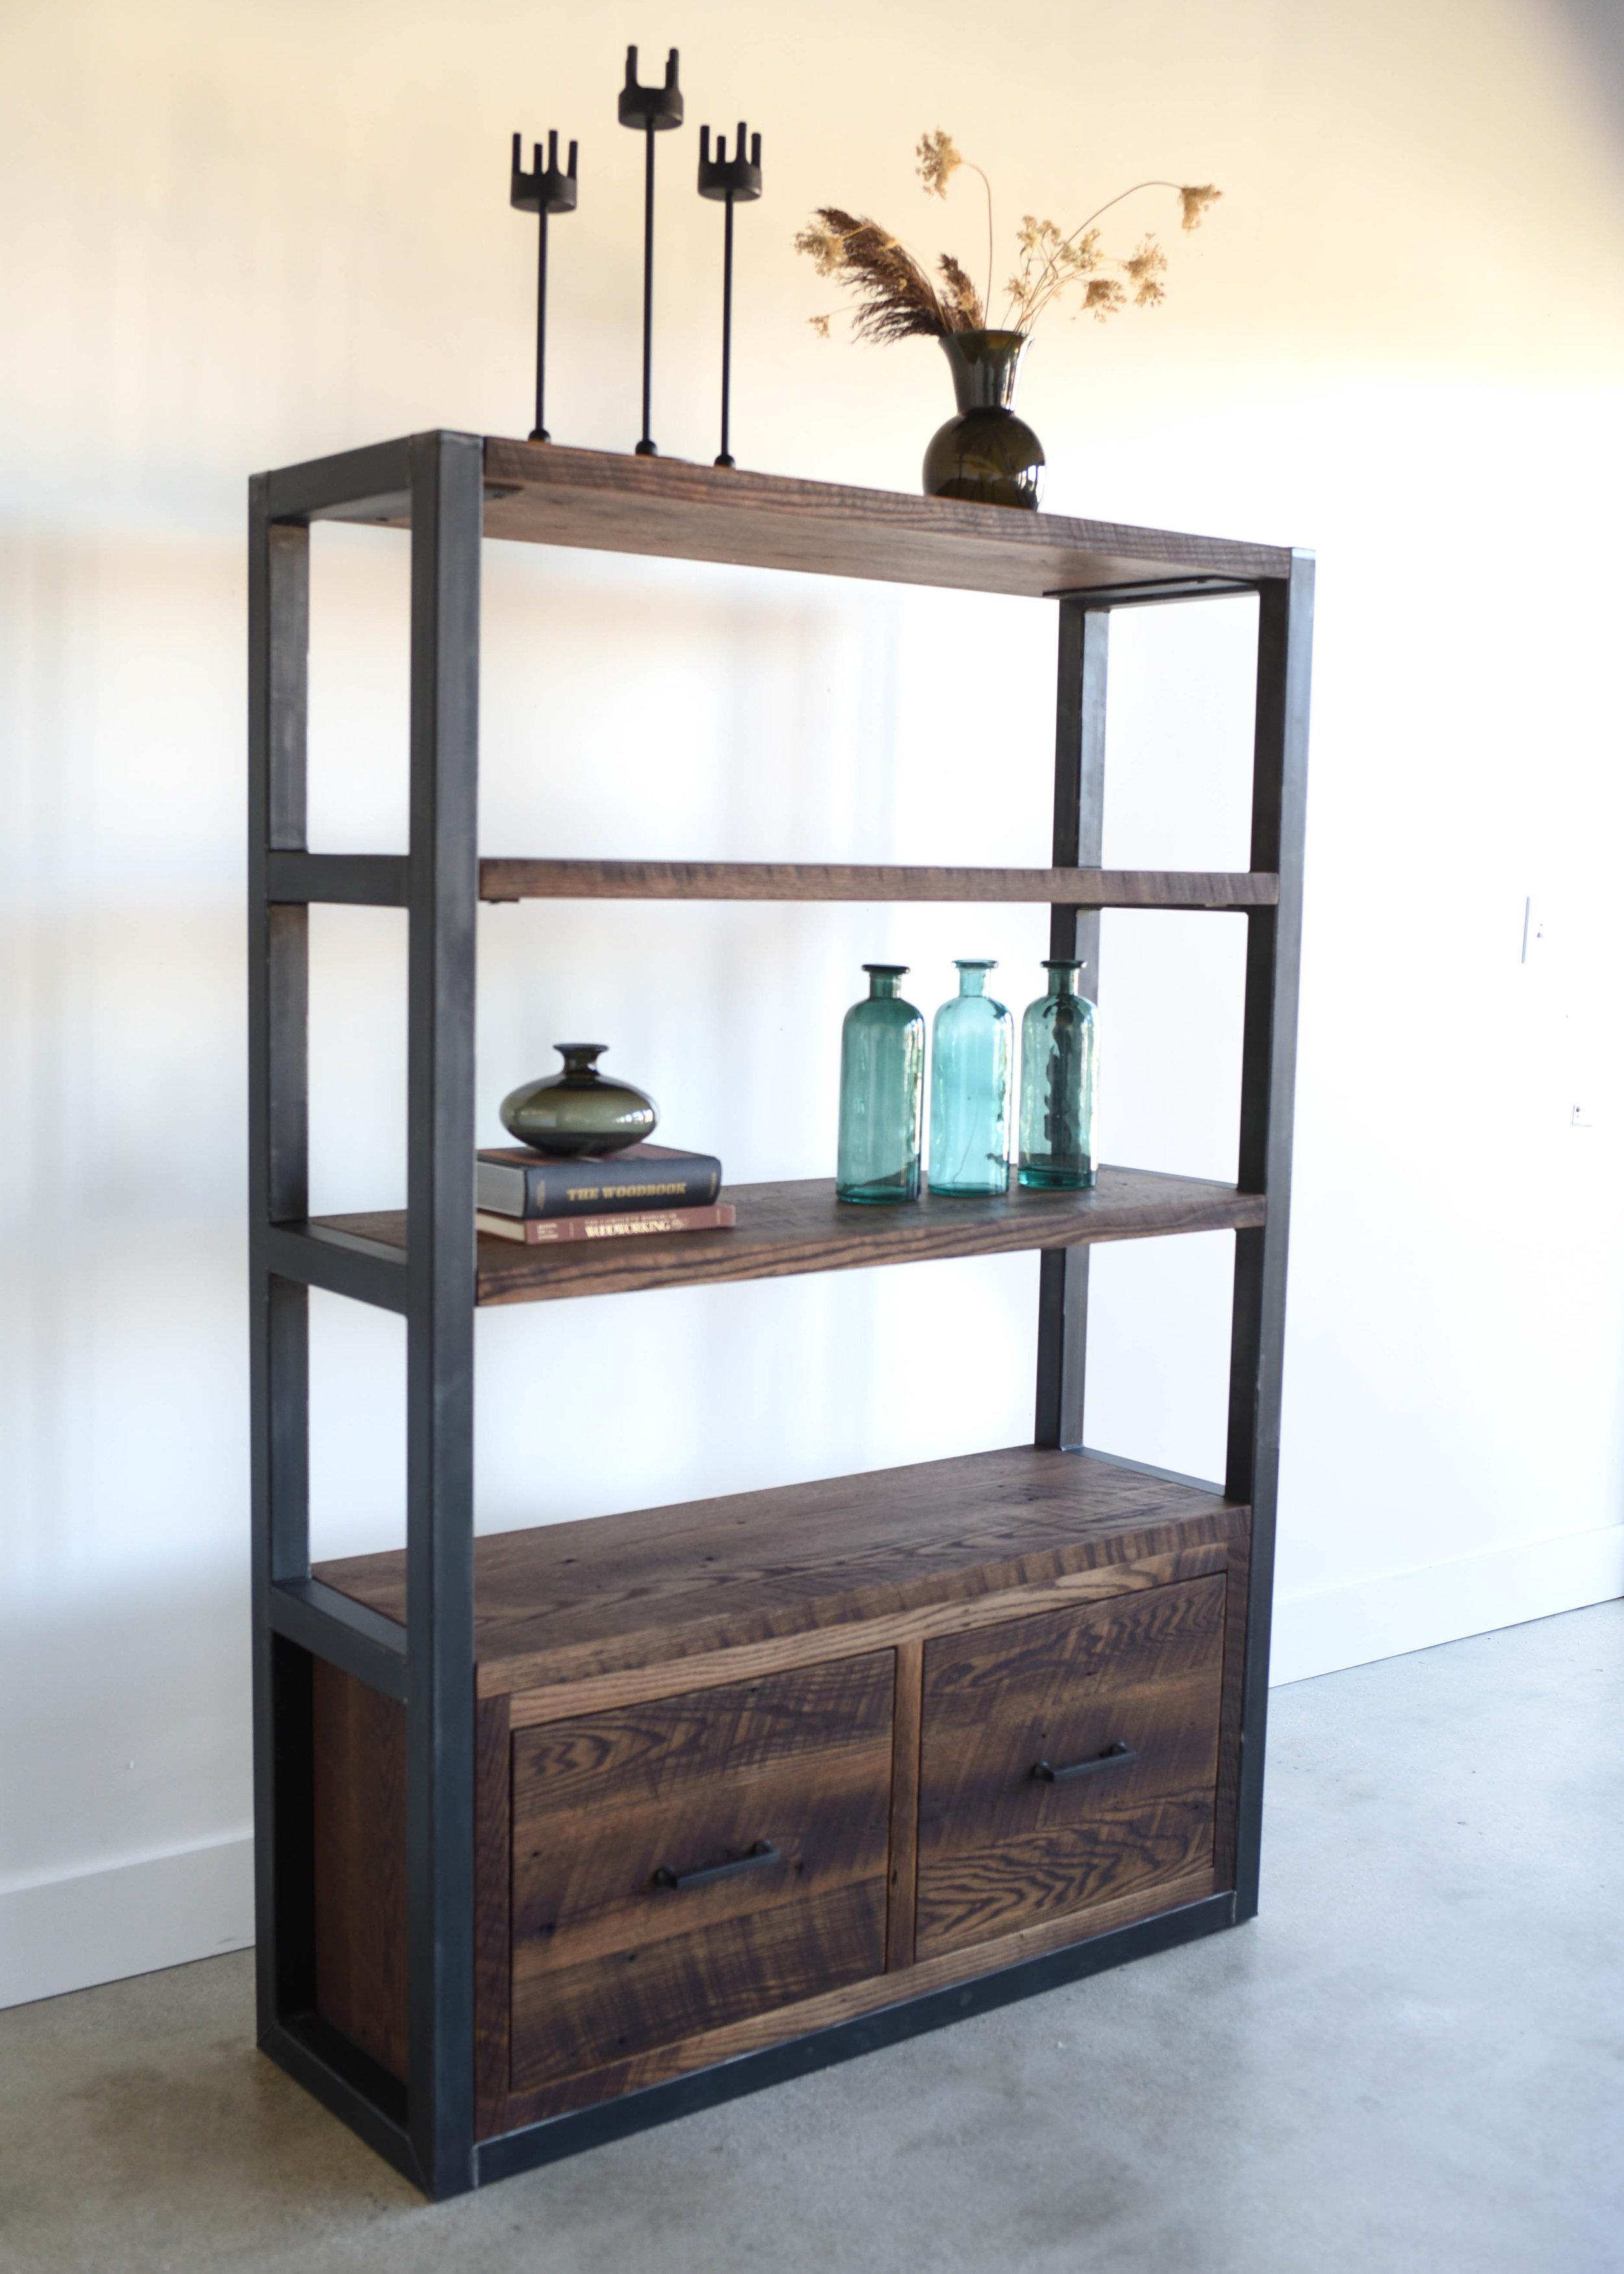 Industrial Reclaimed Wood Bookshelf Steel Frame What We Make